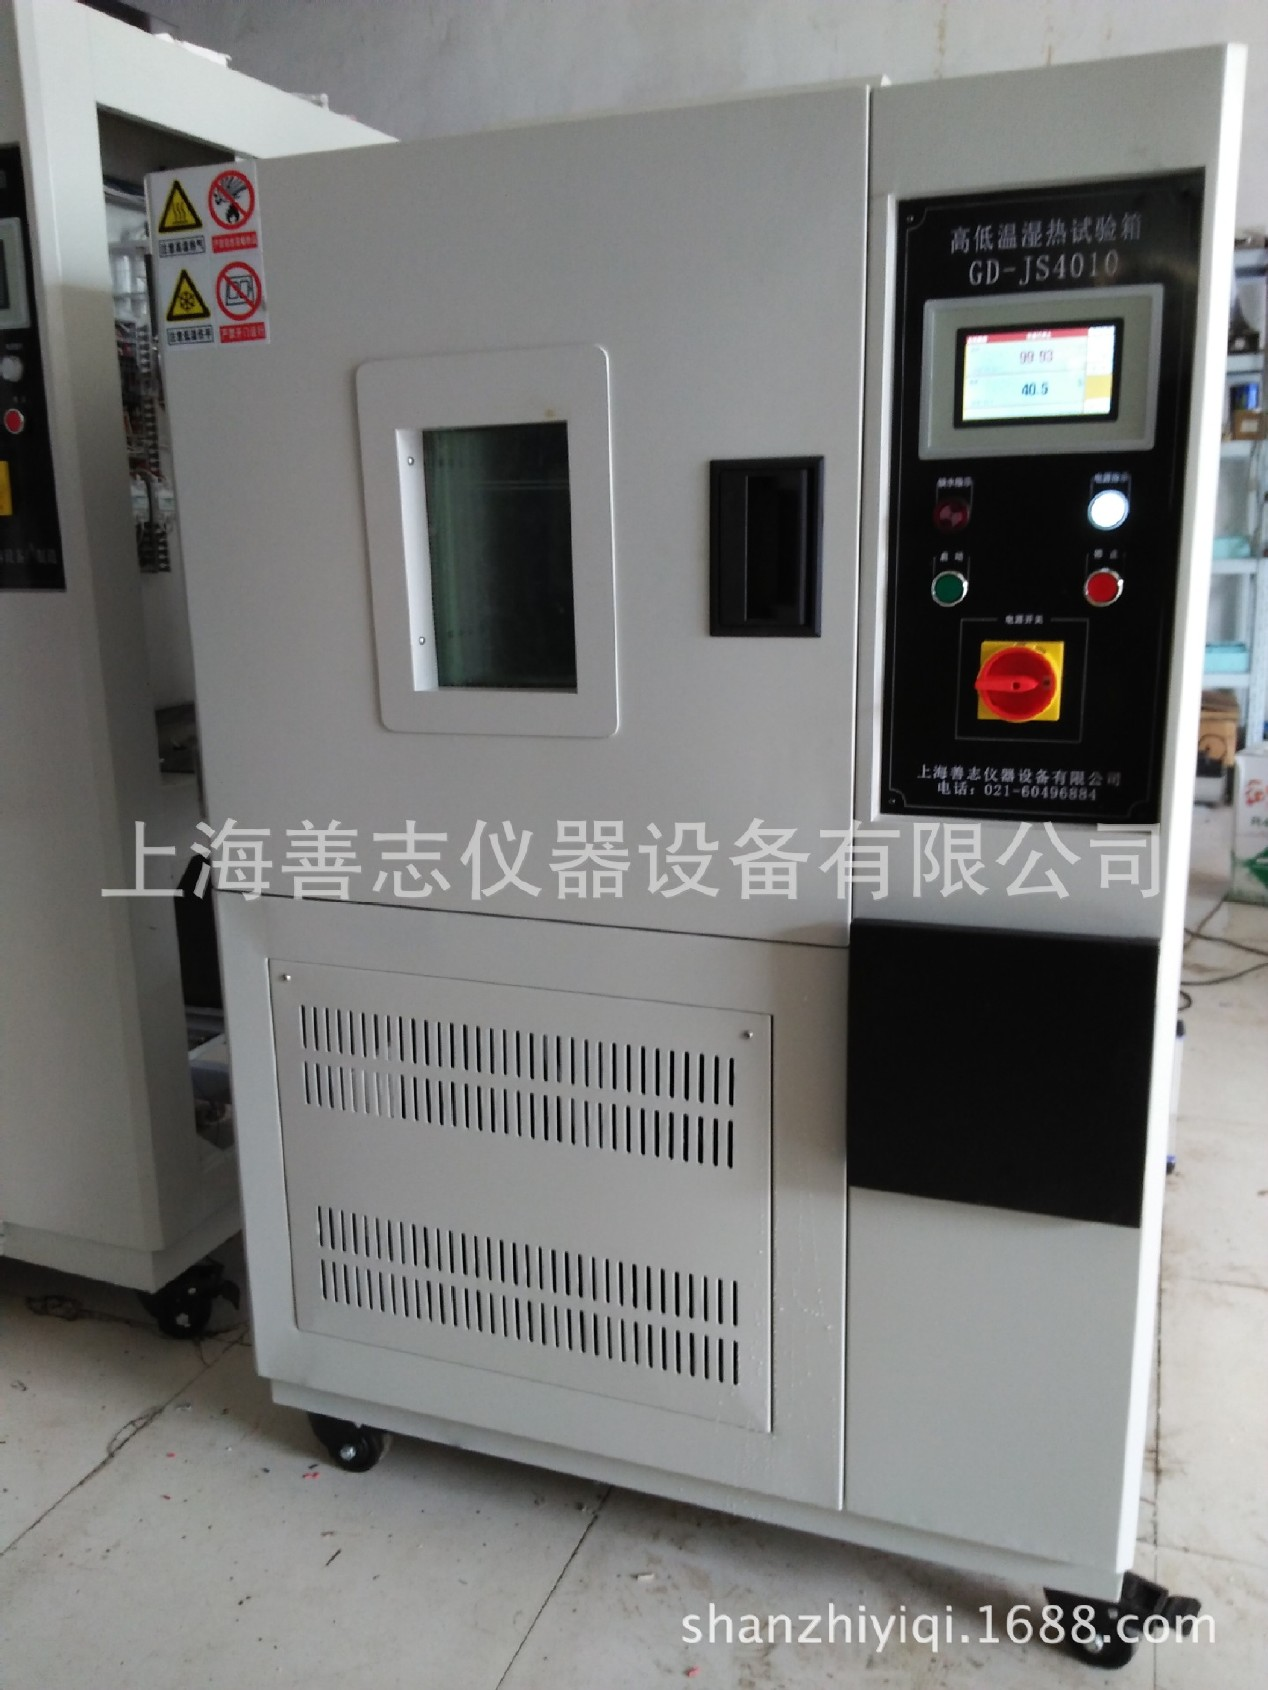 50L恒温恒湿箱 -40度低温试验箱 恒湿箱 模拟人工环境试验箱